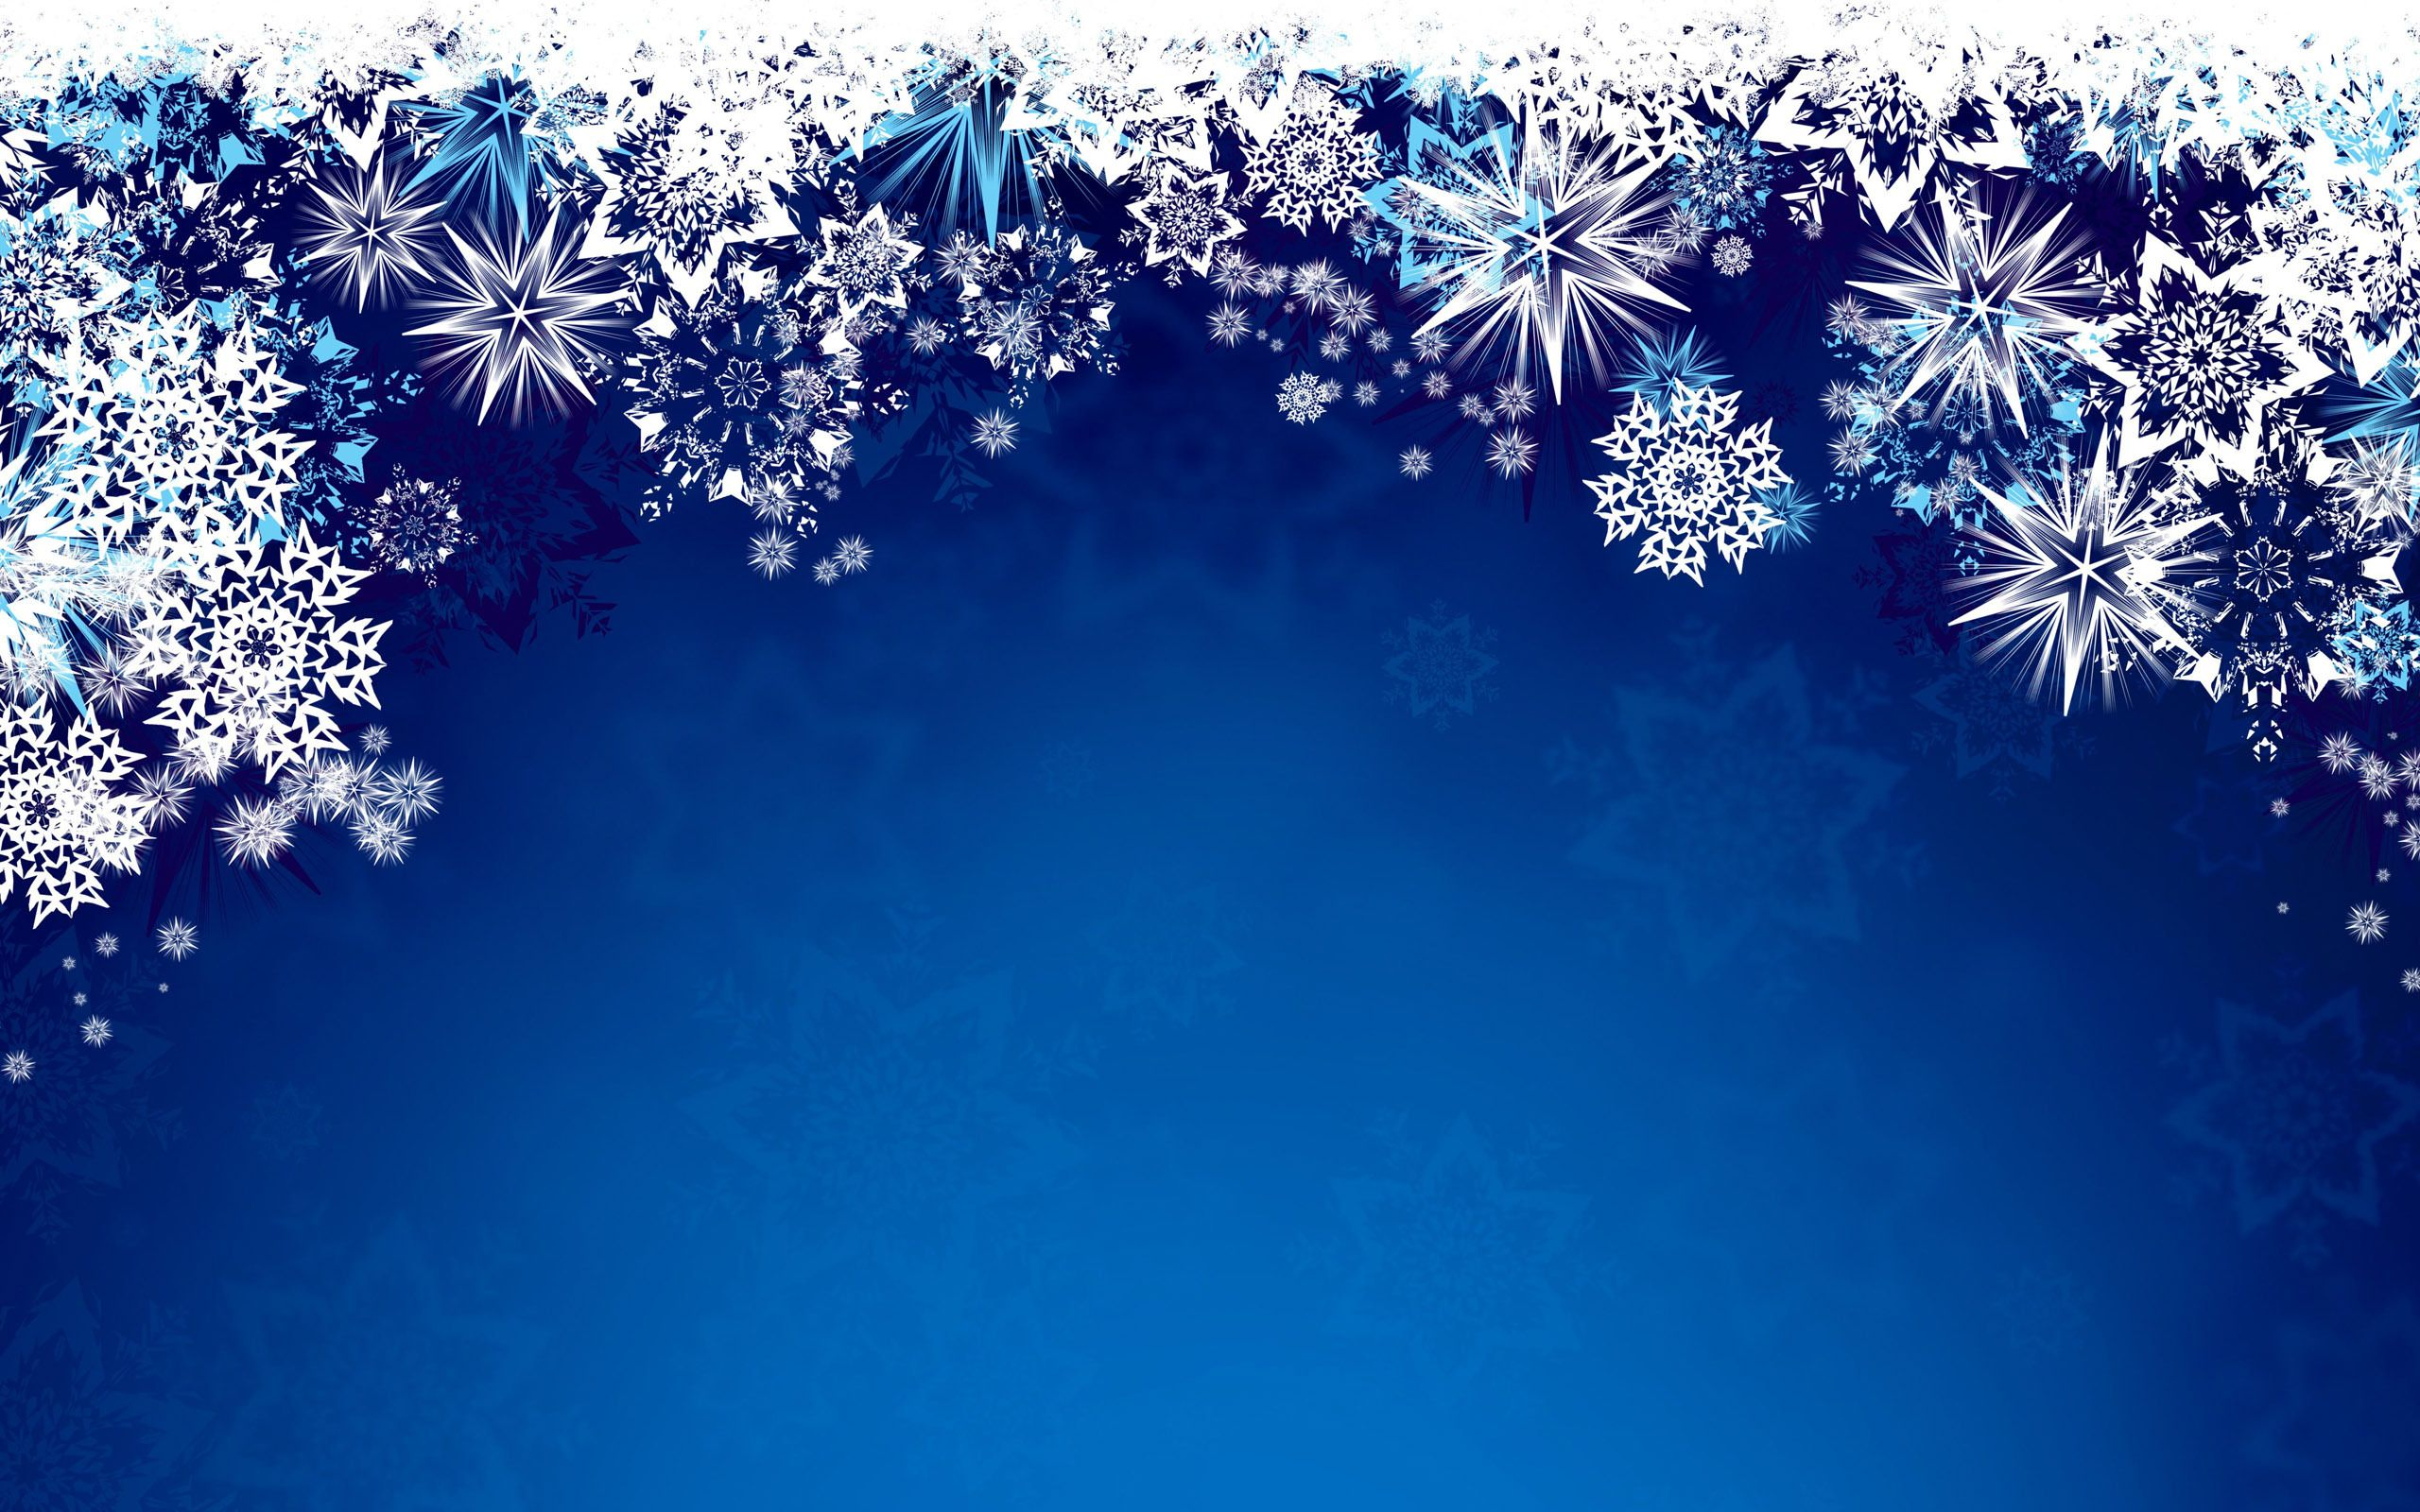 White Real Snowflakes Falling On Blue Background Stock ... |Real Snowflakes Background